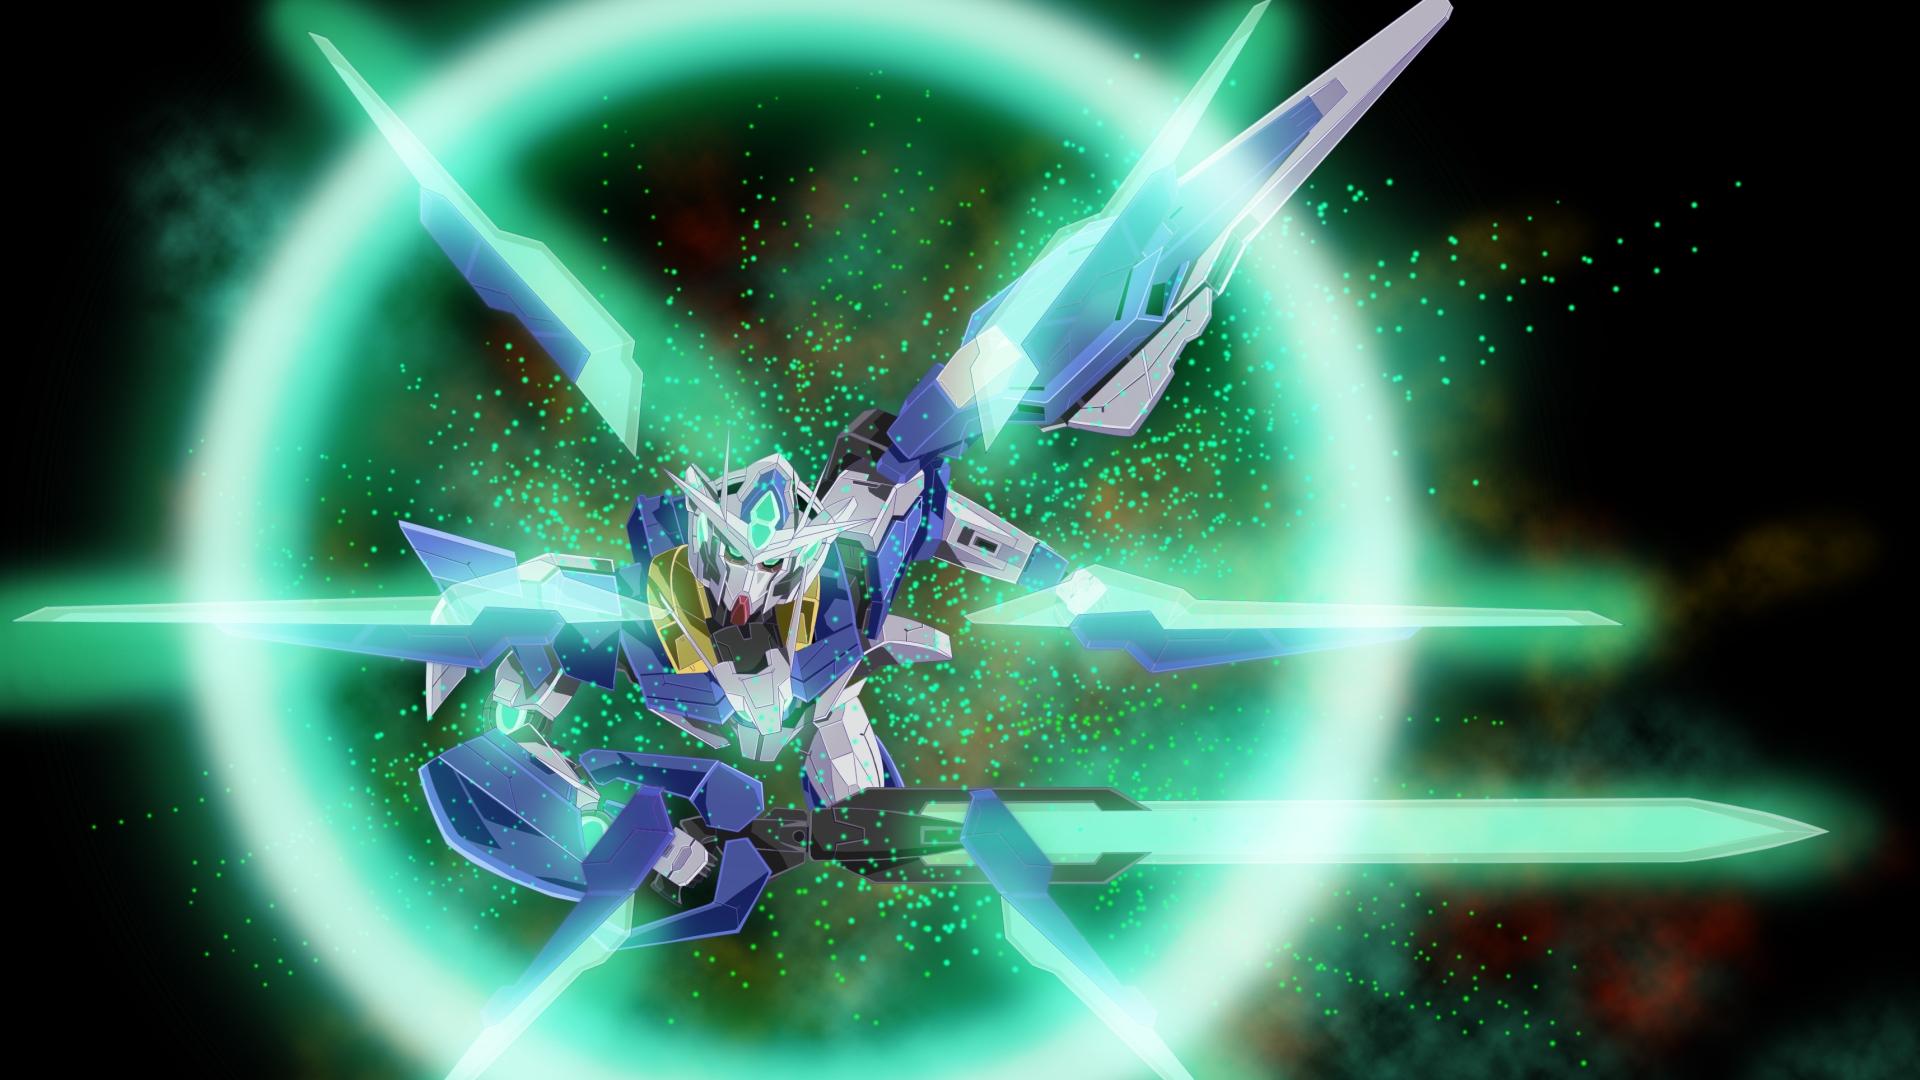 Mobile Suit Gundam 00 Hd Wallpaper 632978 Zerochan Anime